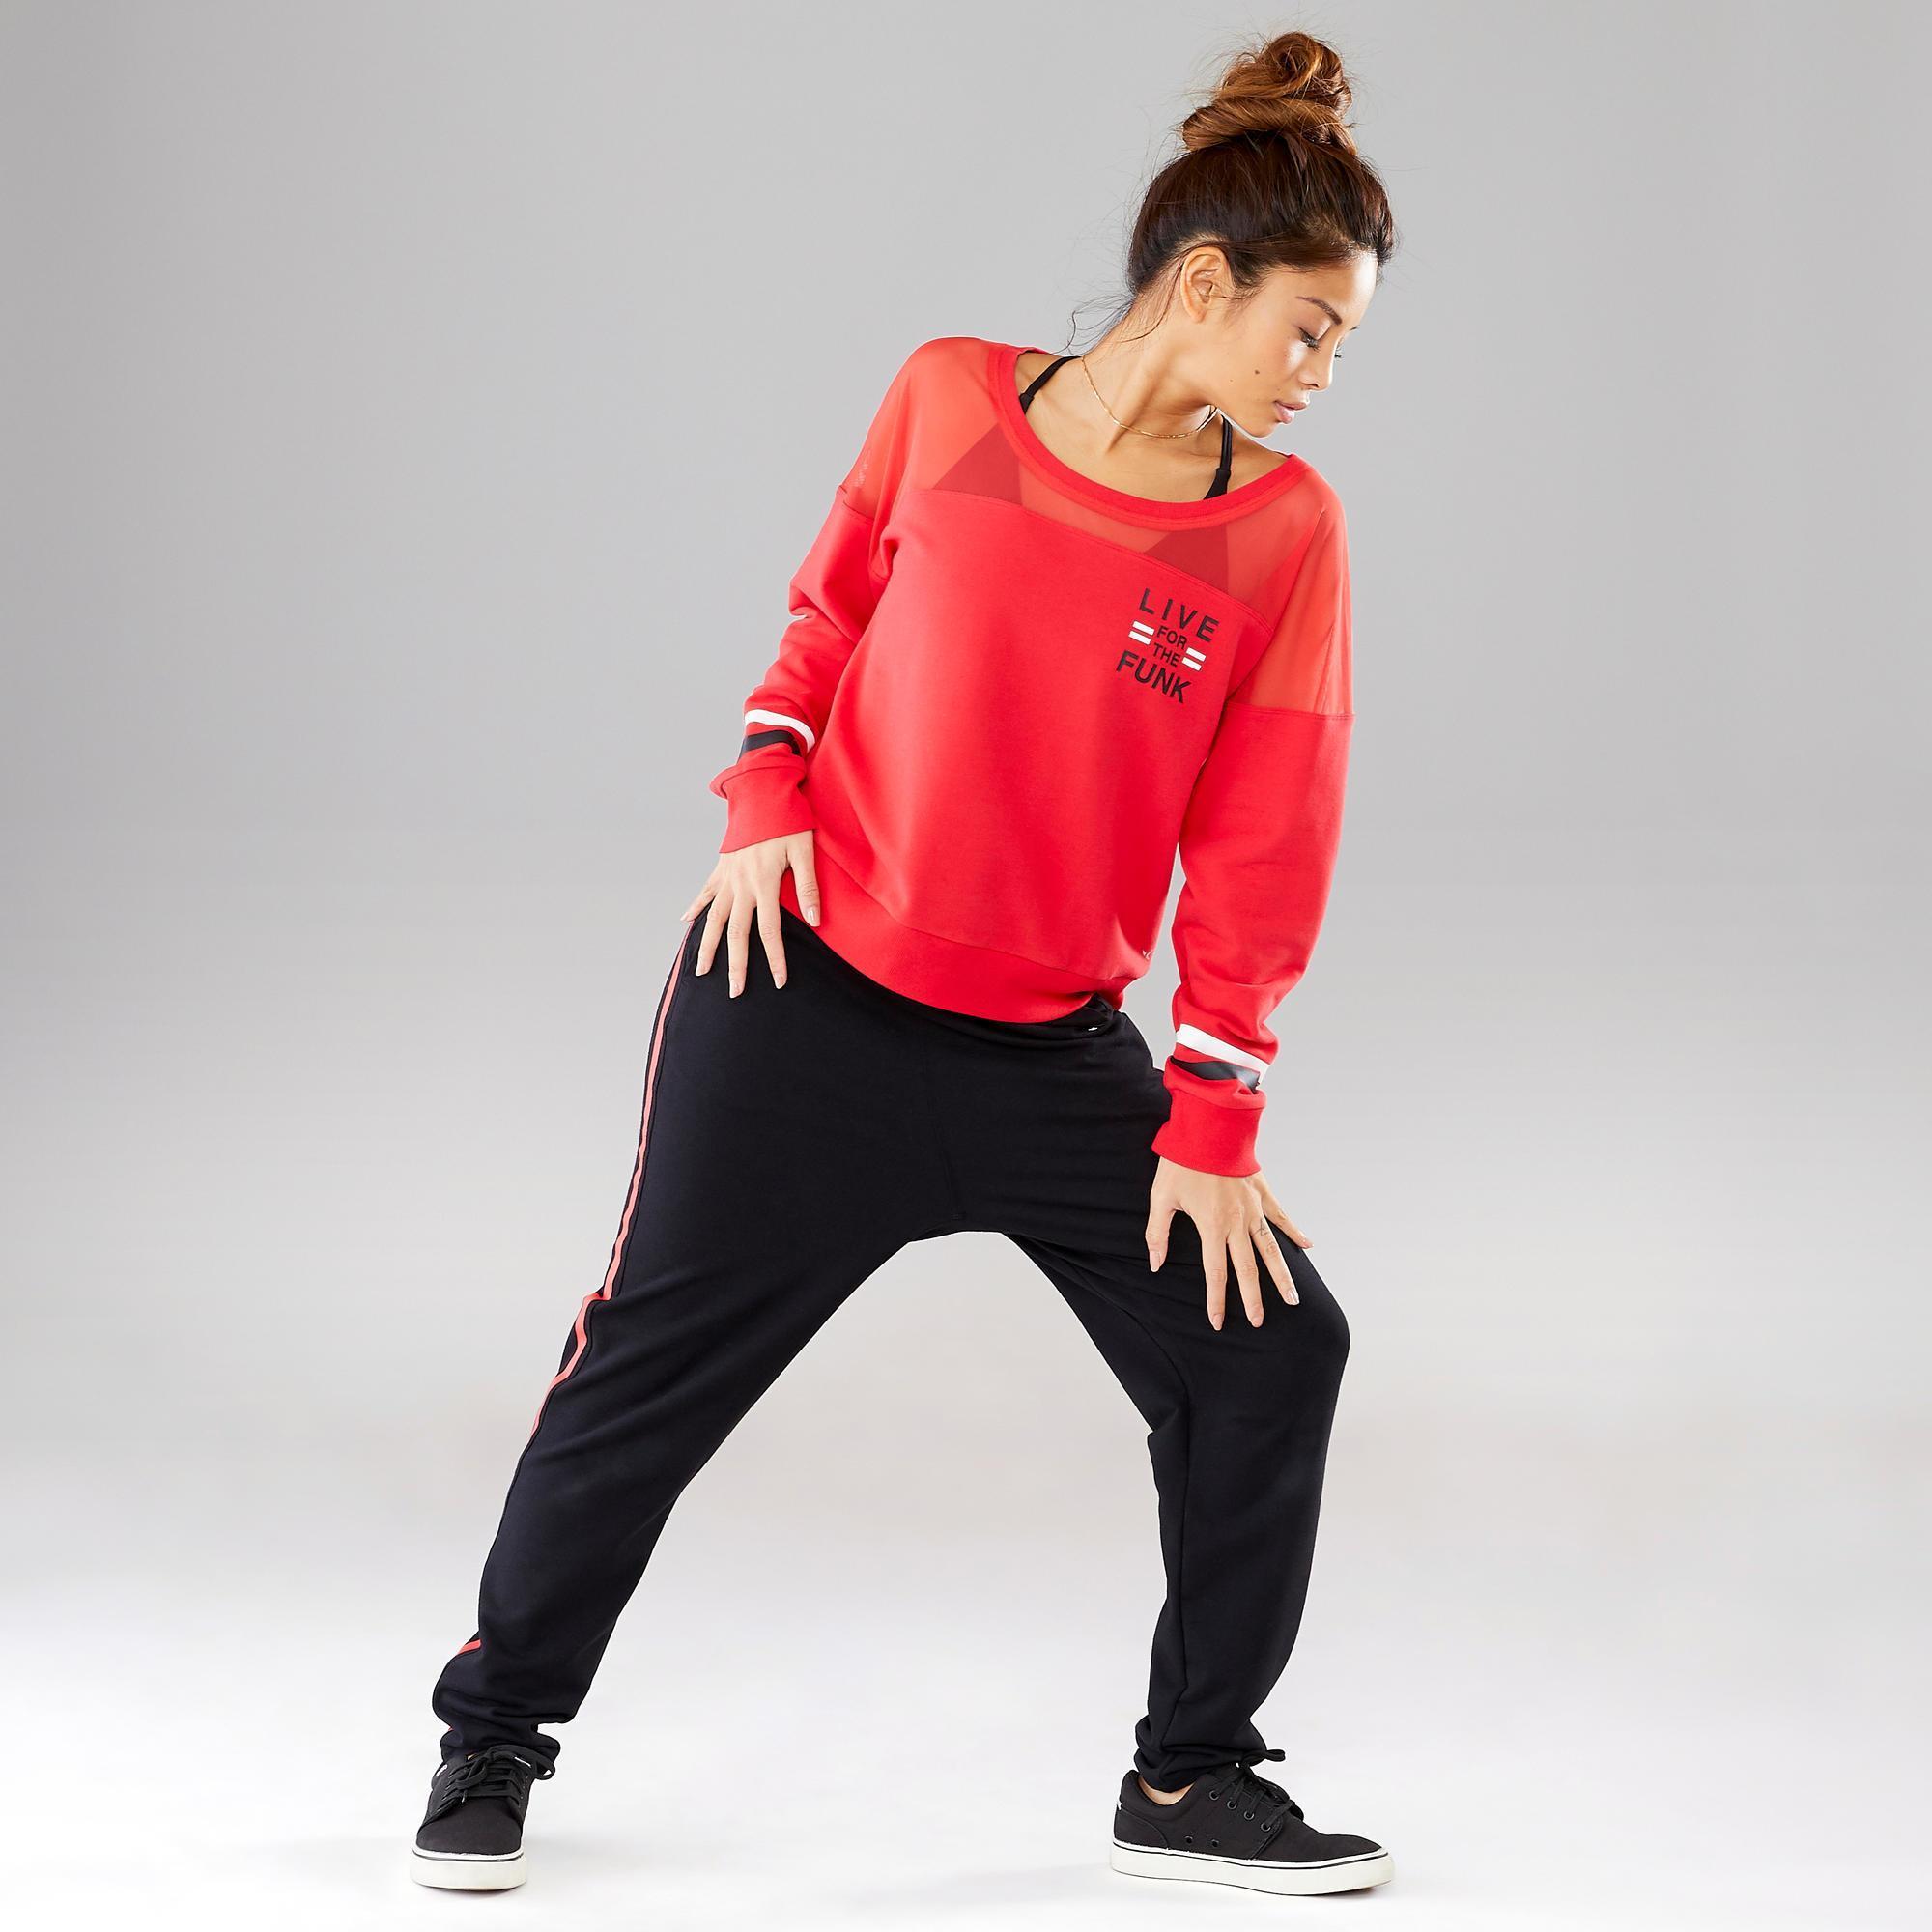 77d29bf4f9bd Comprar Ropa de Hip Hop Online | Decathlon